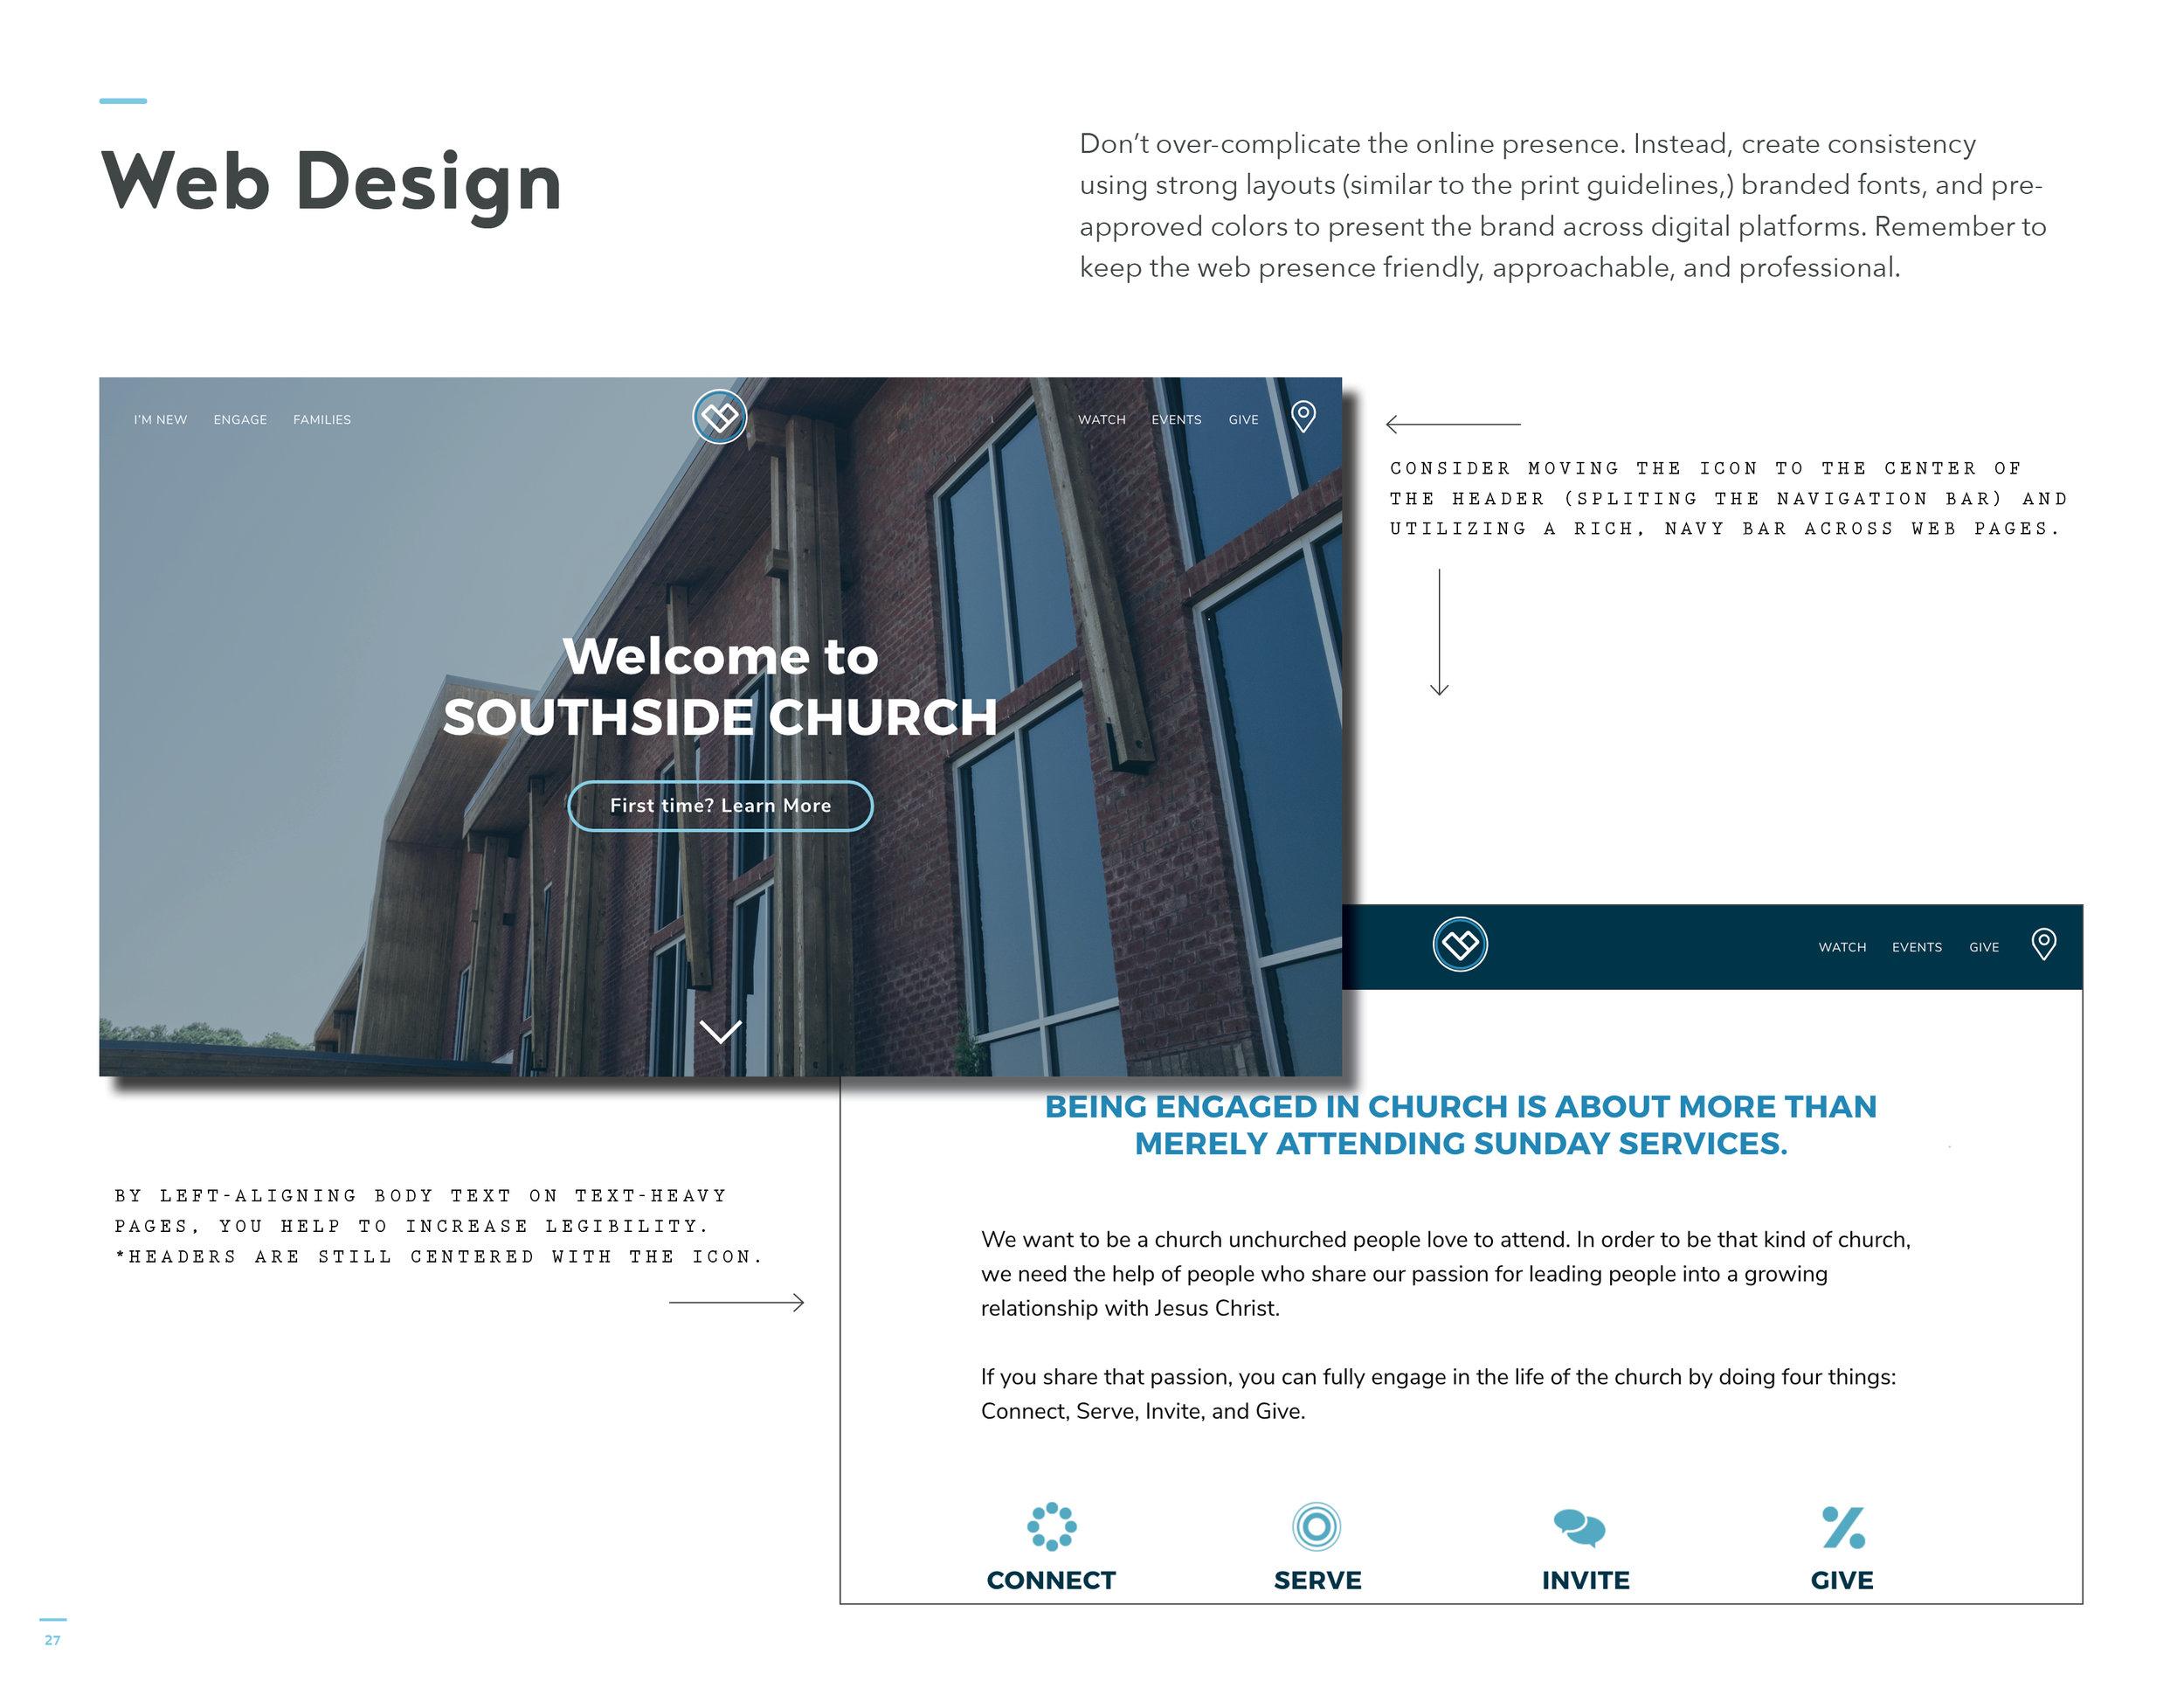 south_website.jpg